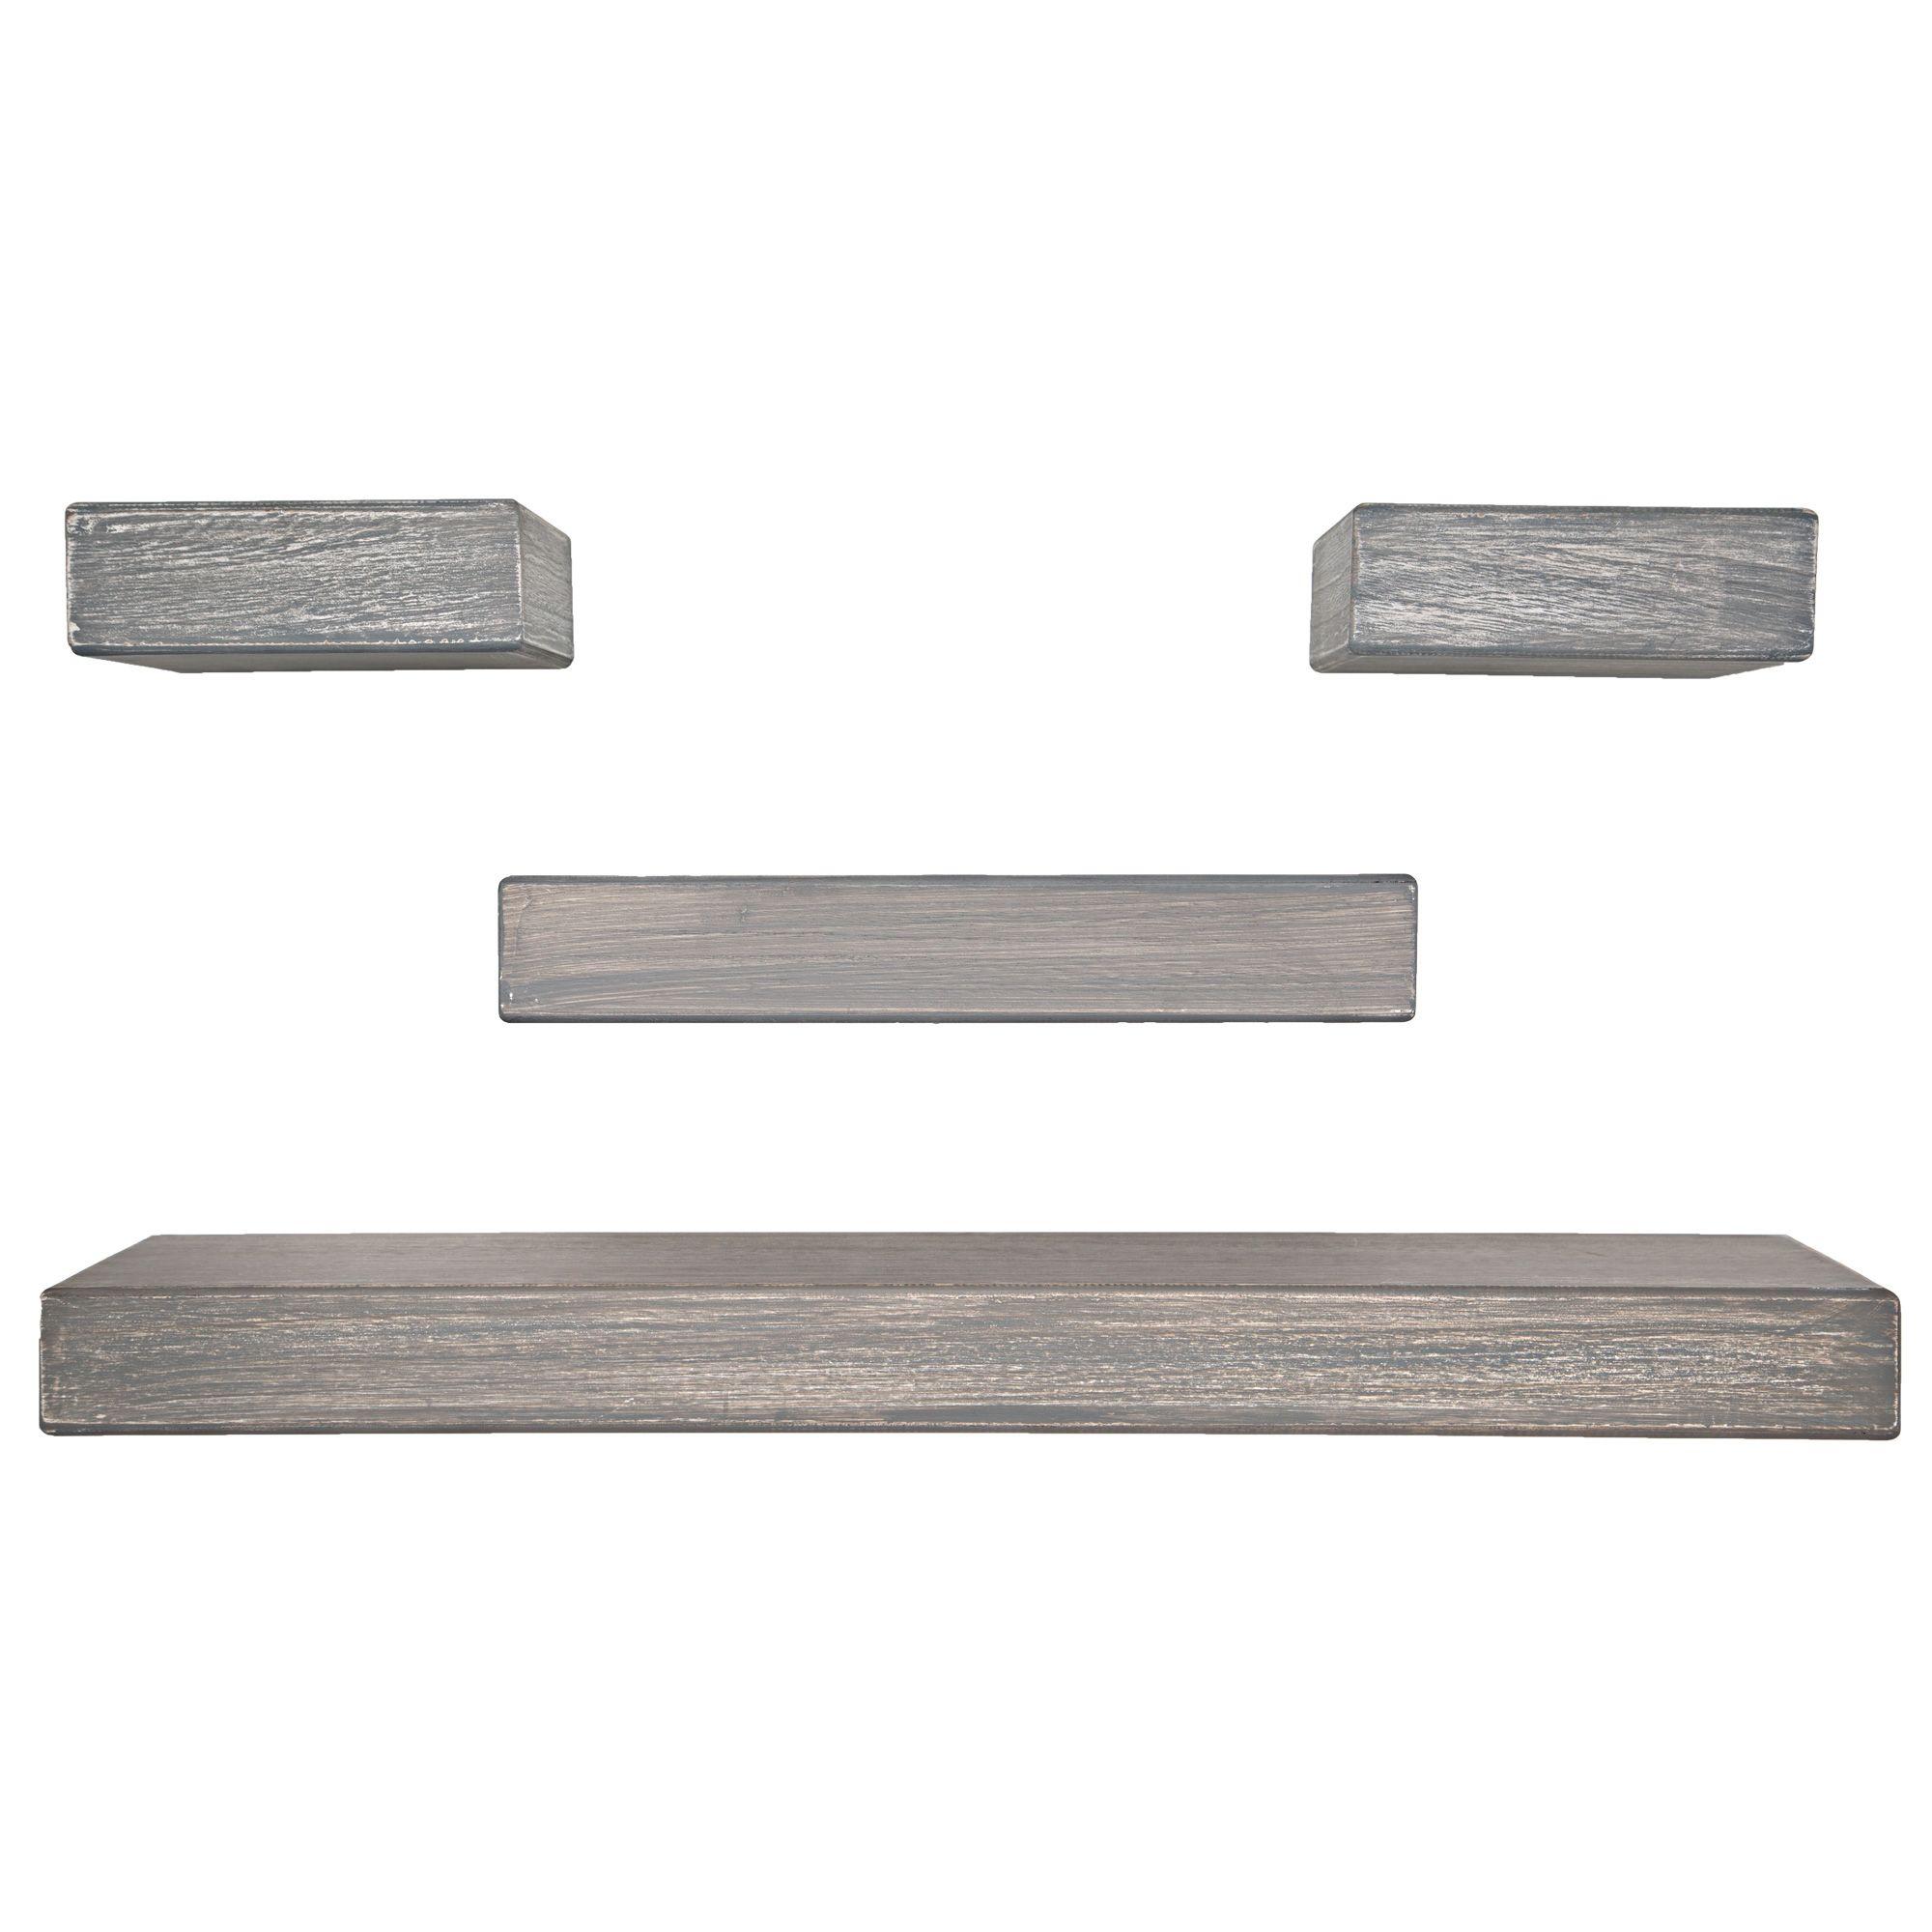 4 Piece Distressed Chunky Ledge Set Grey Basement Decor Gordmans Spa Rooms